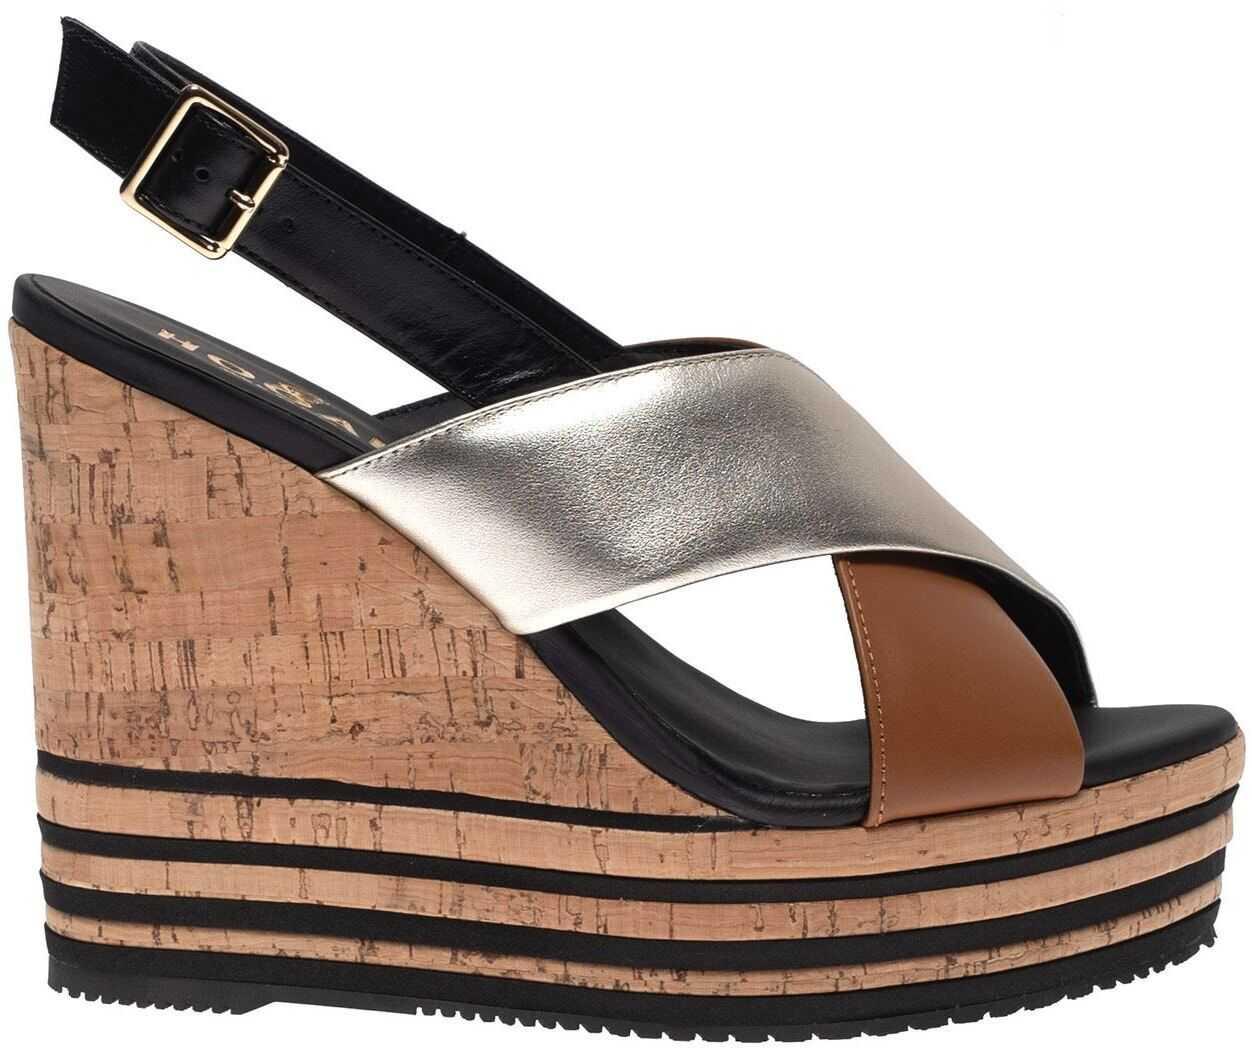 Hogan Wedge Sandals In Black, Beige And Silver Multi